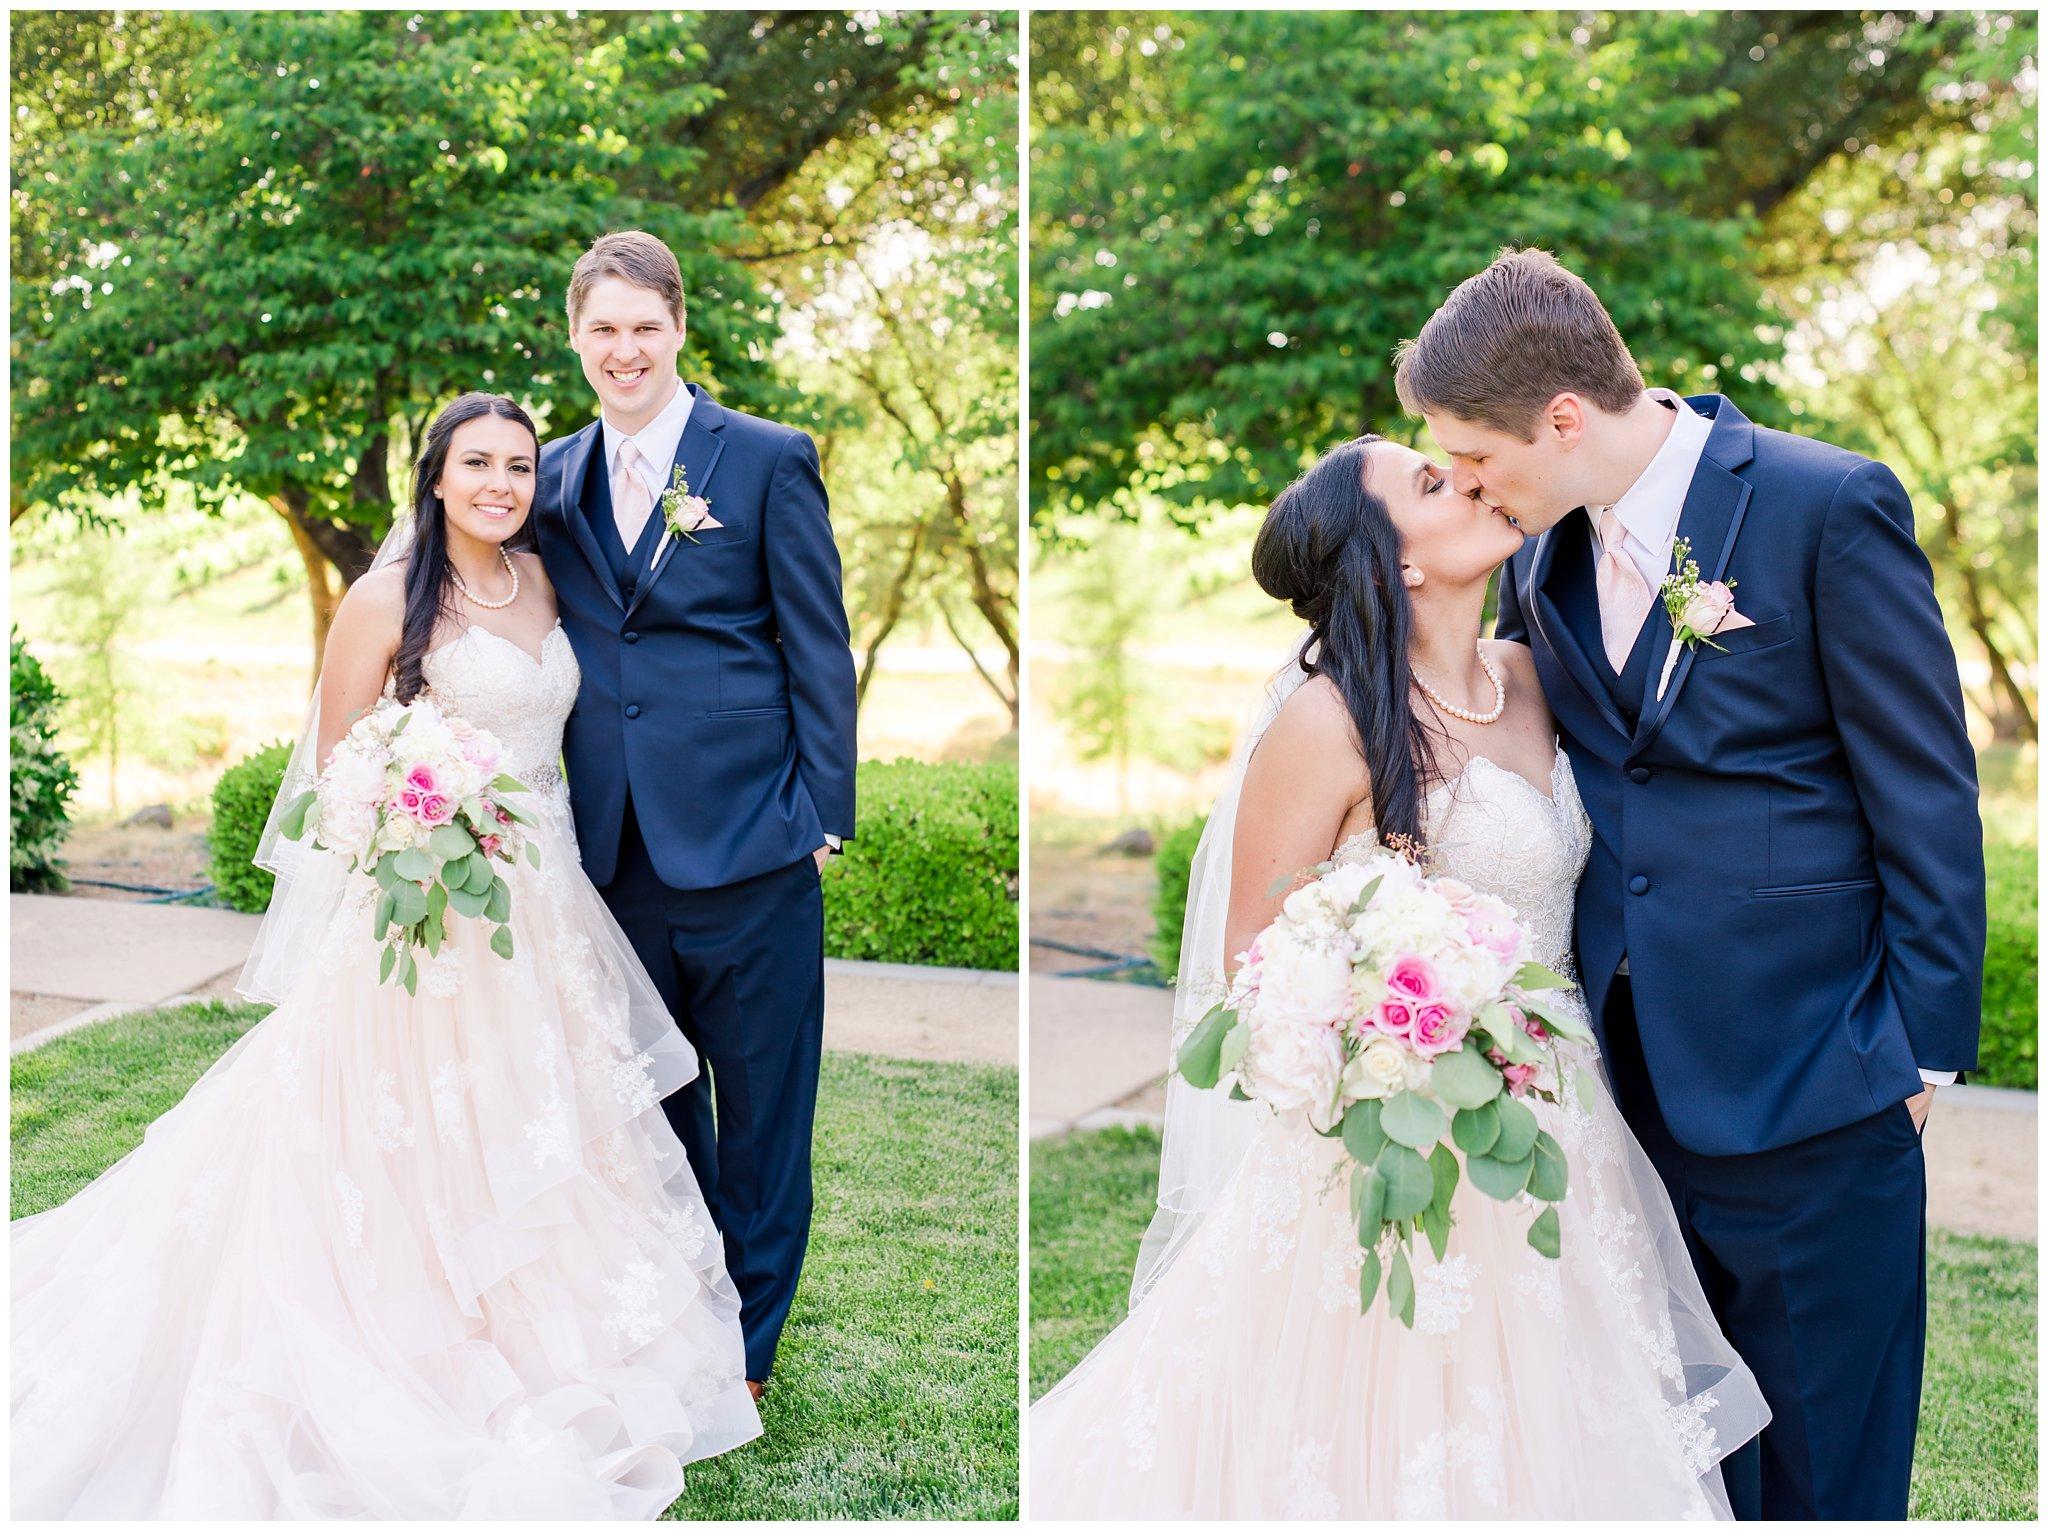 David-Girard-Vineyards-Wedding-Wedgewood-Weddings-49.jpg